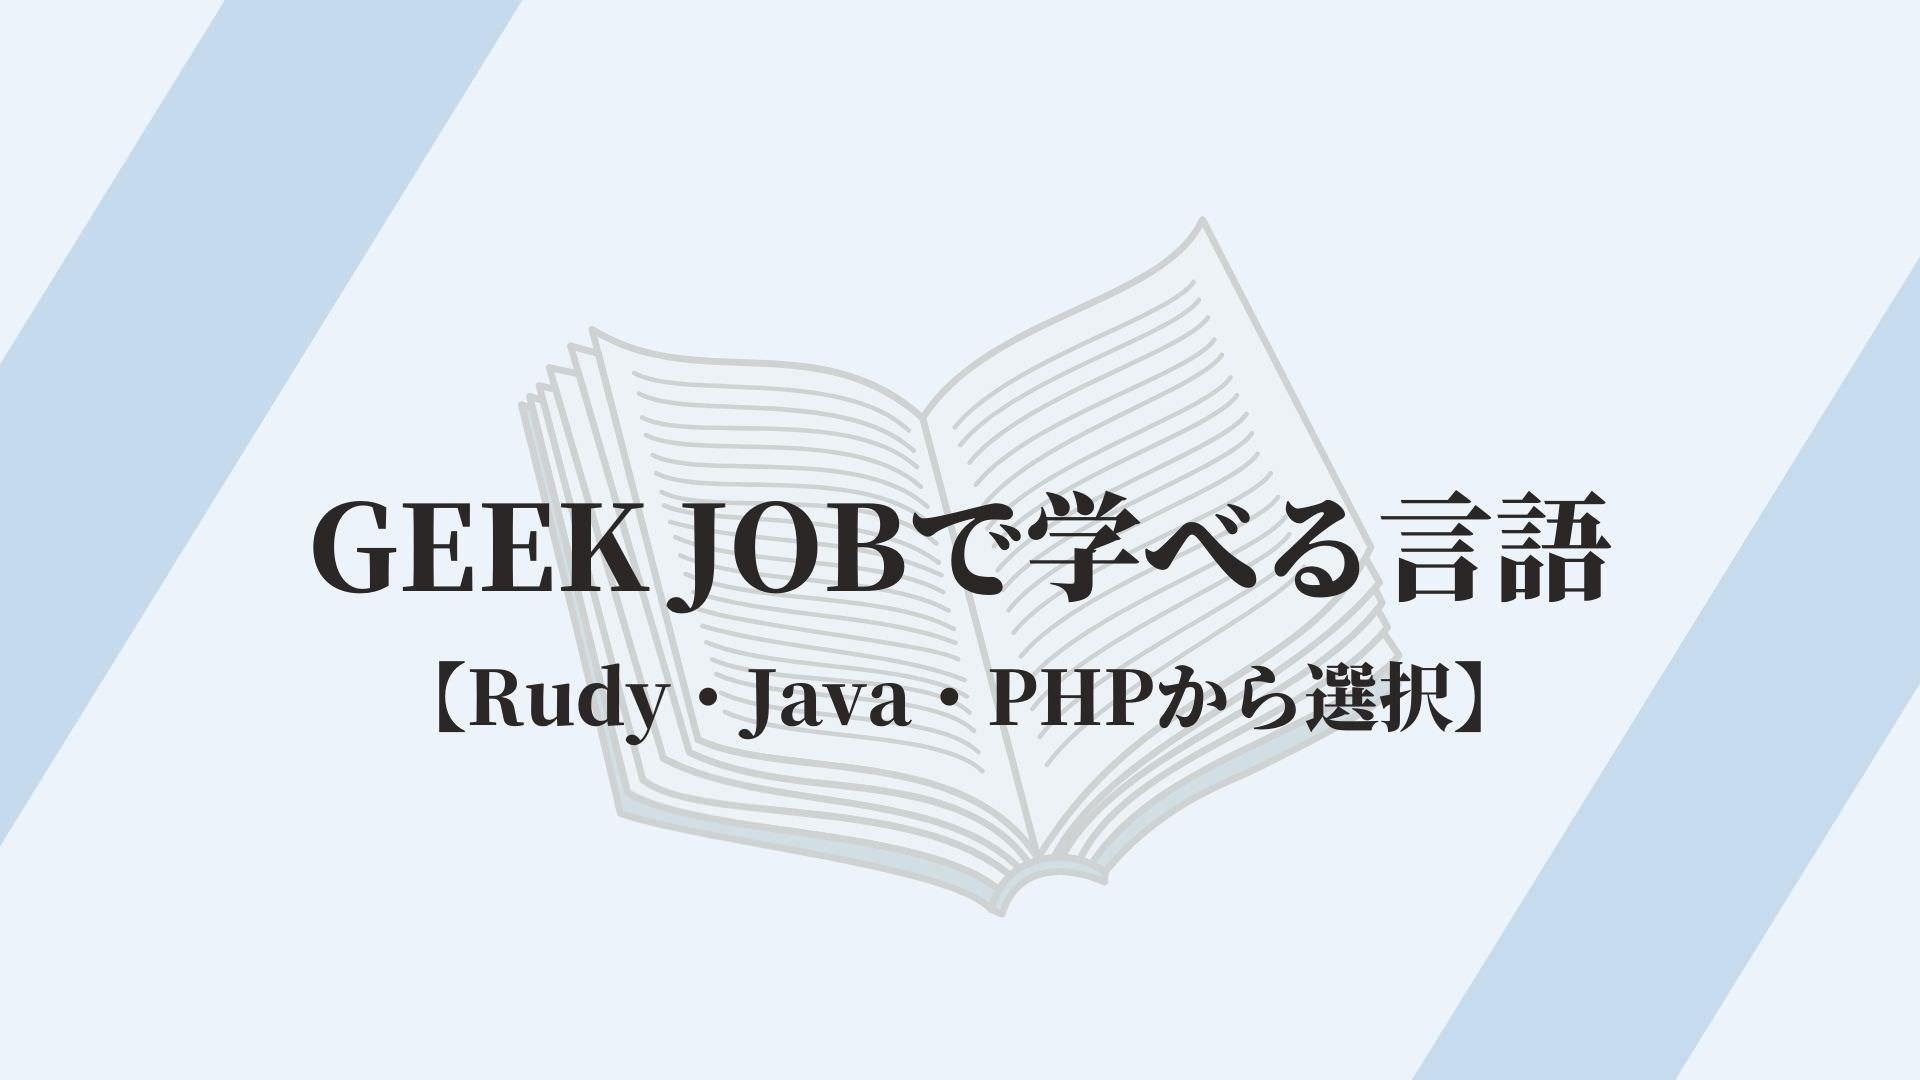 GEEK JOBで学べる言語【Rudy・Java・PHPから選択】